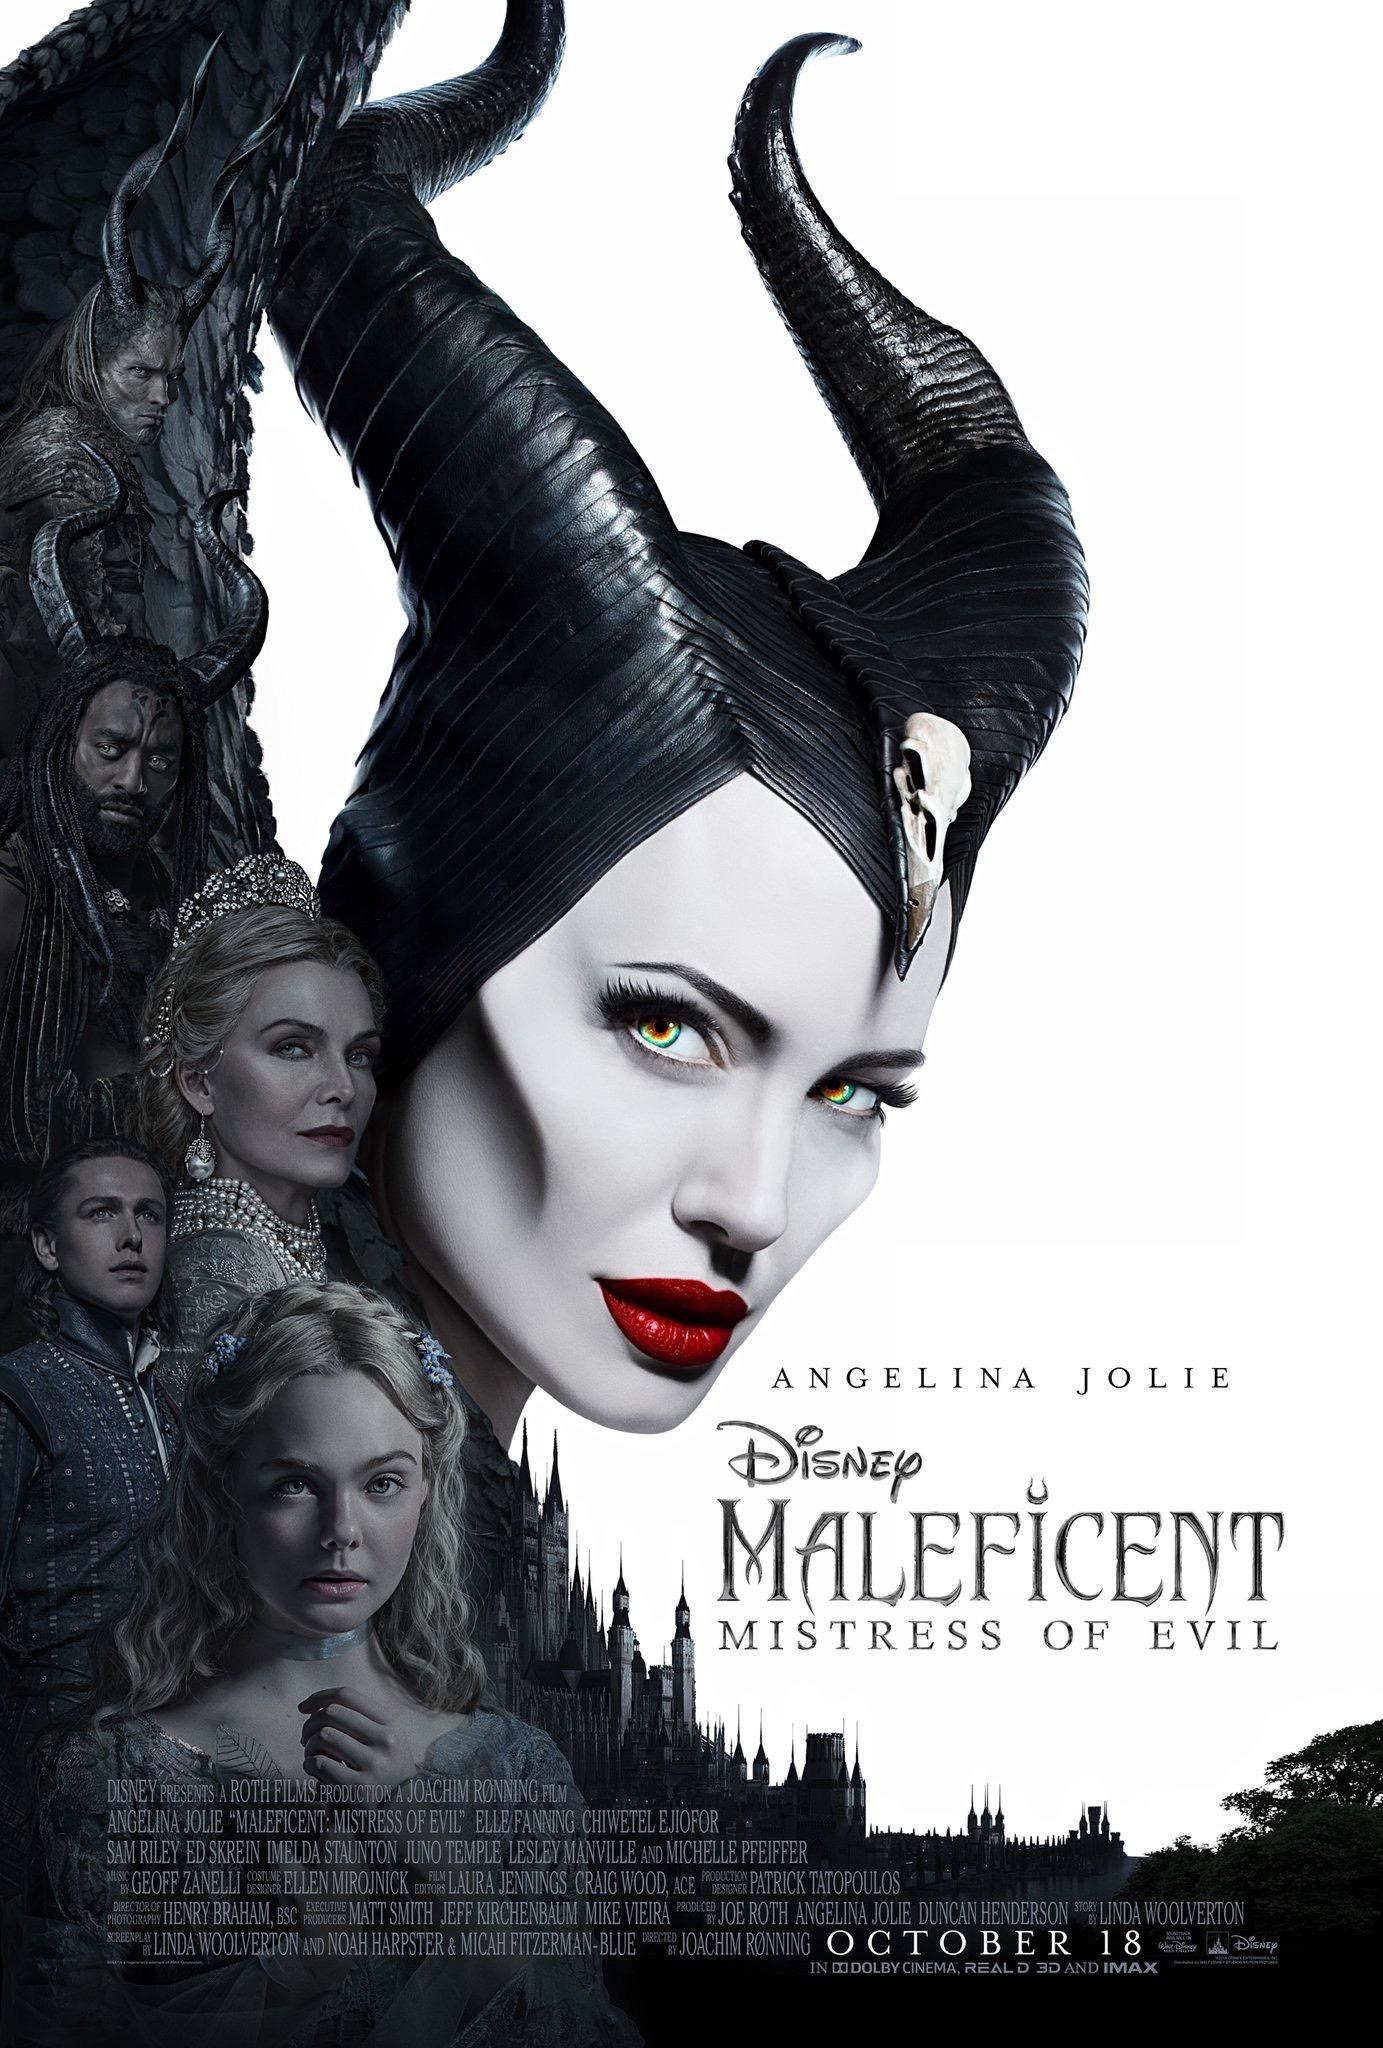 szmk_maleficent_mistress_of_evil_demona_disney_csipkerozsika_angelina_jolie_sotetseg_urnoje_2_14.jpg